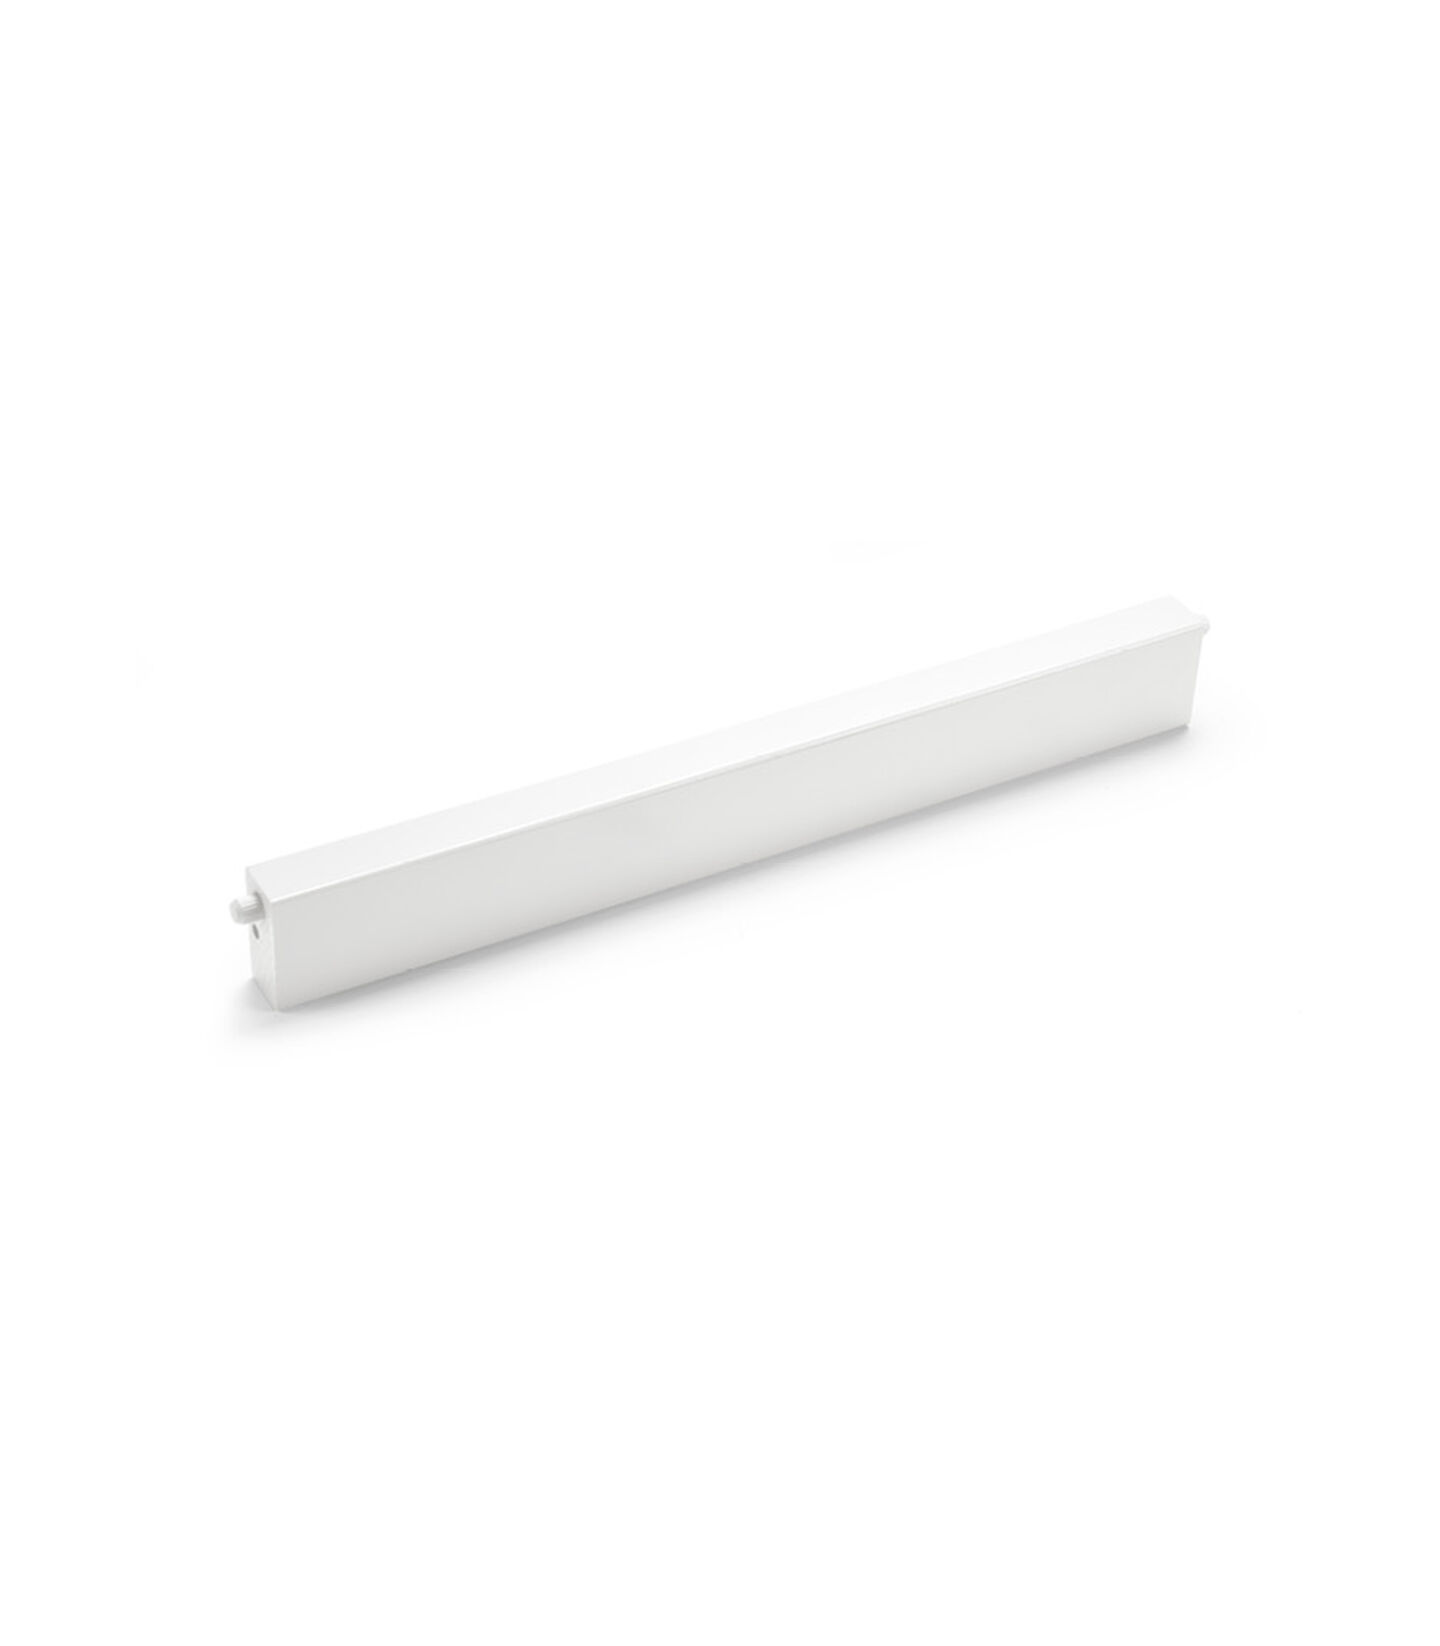 Tripp Trapp® Floorbrace White, White, mainview view 1